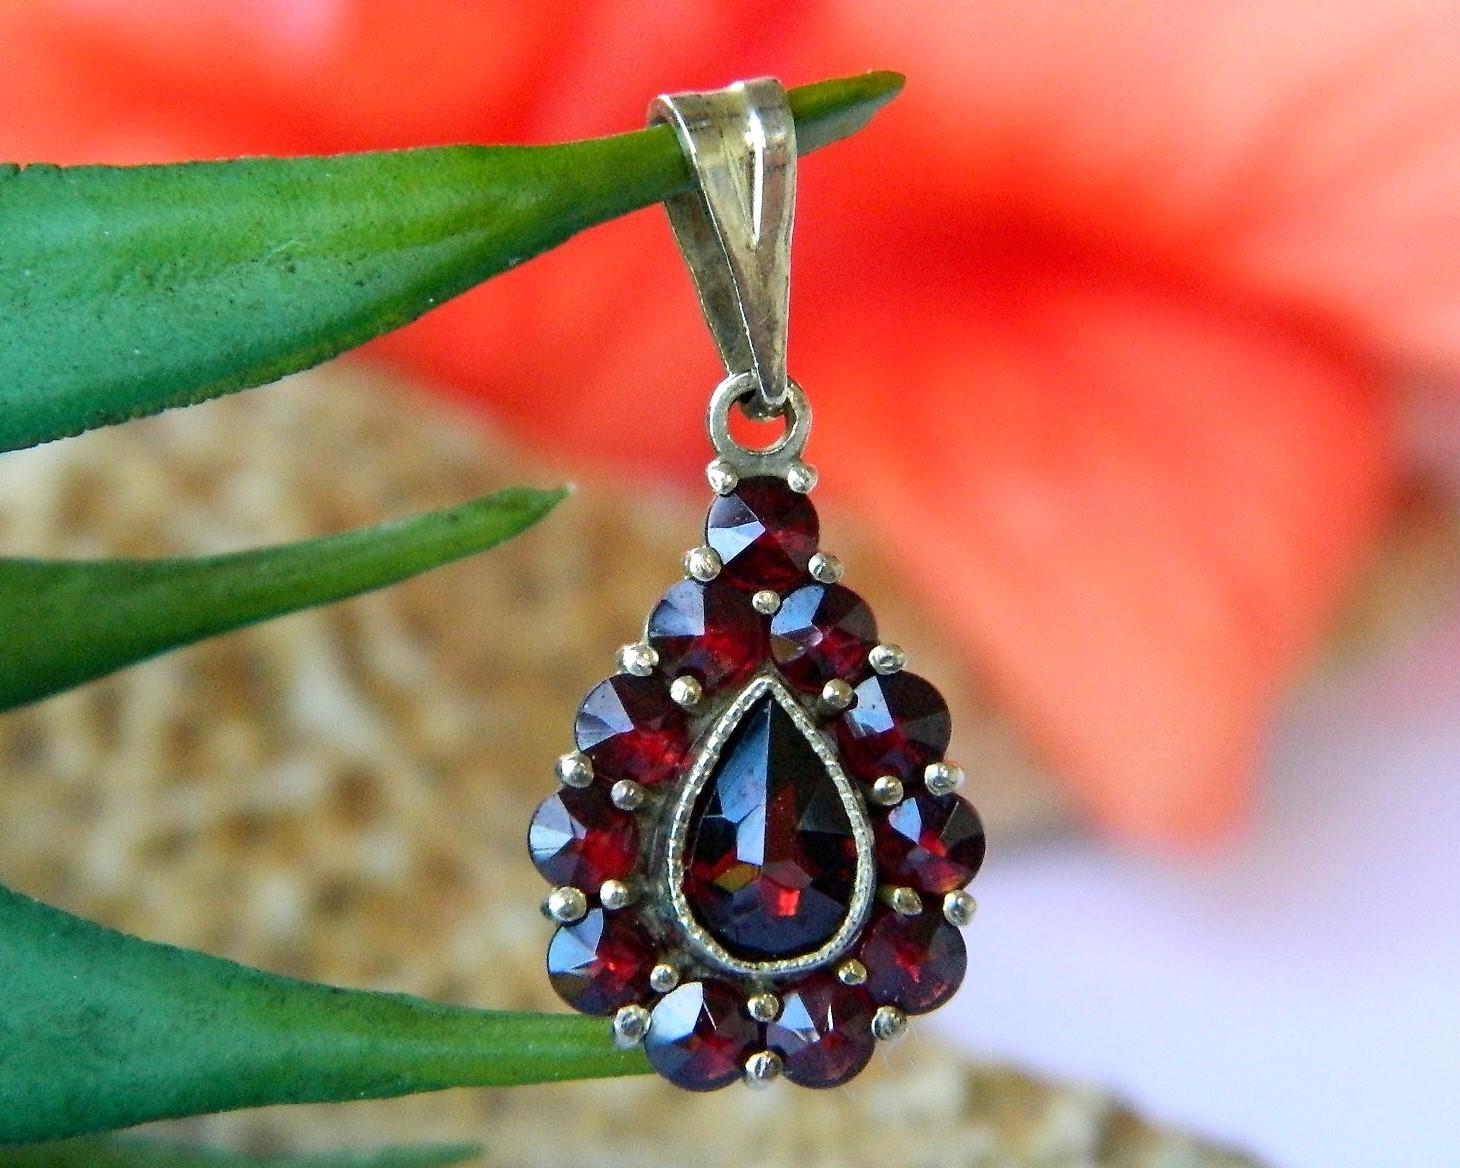 Vintage bohemian czech red garnet teardrop miniature pendant charm